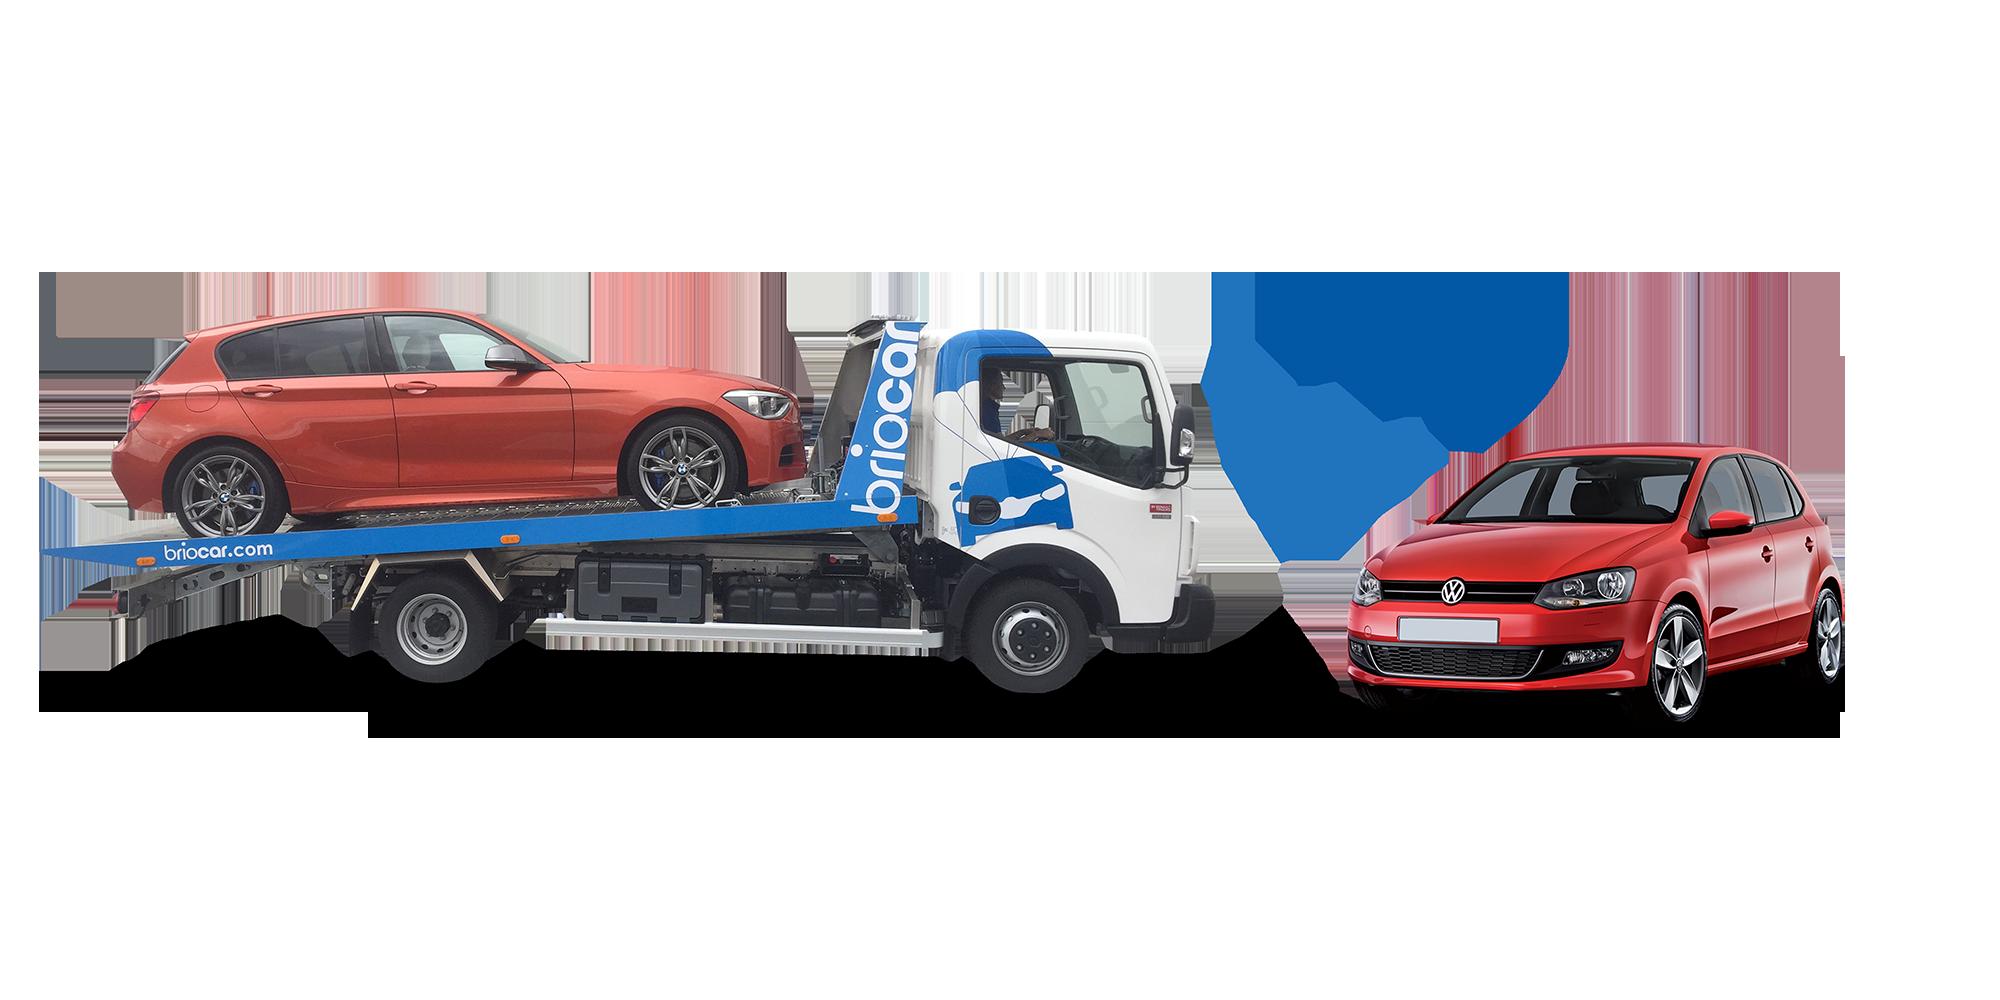 Briocar reprend votre voiture